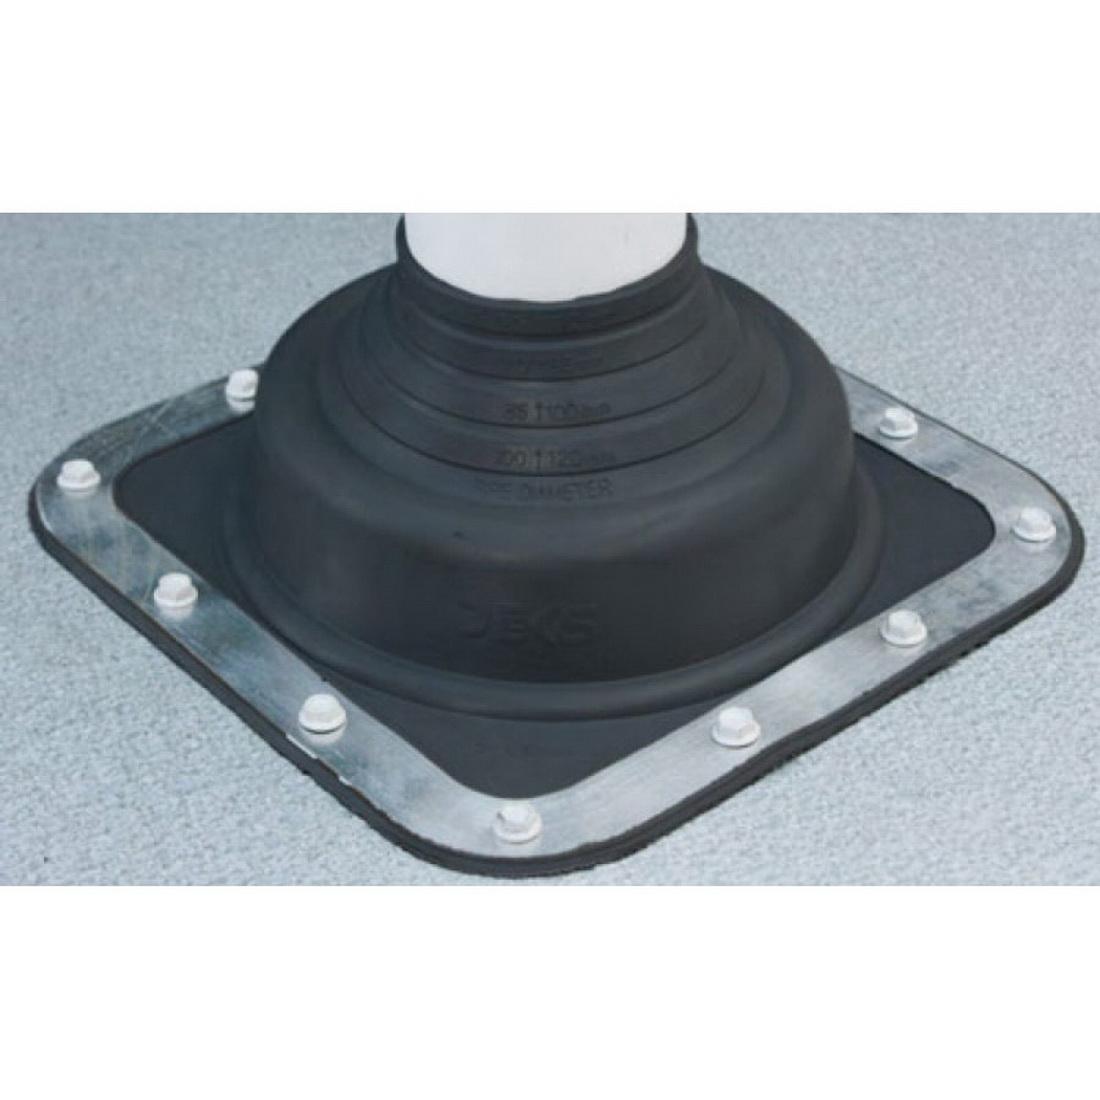 Dektite Premium #2 EPDM Black Base 181mm x 181mm Pipe 50-70mm DFE102BA